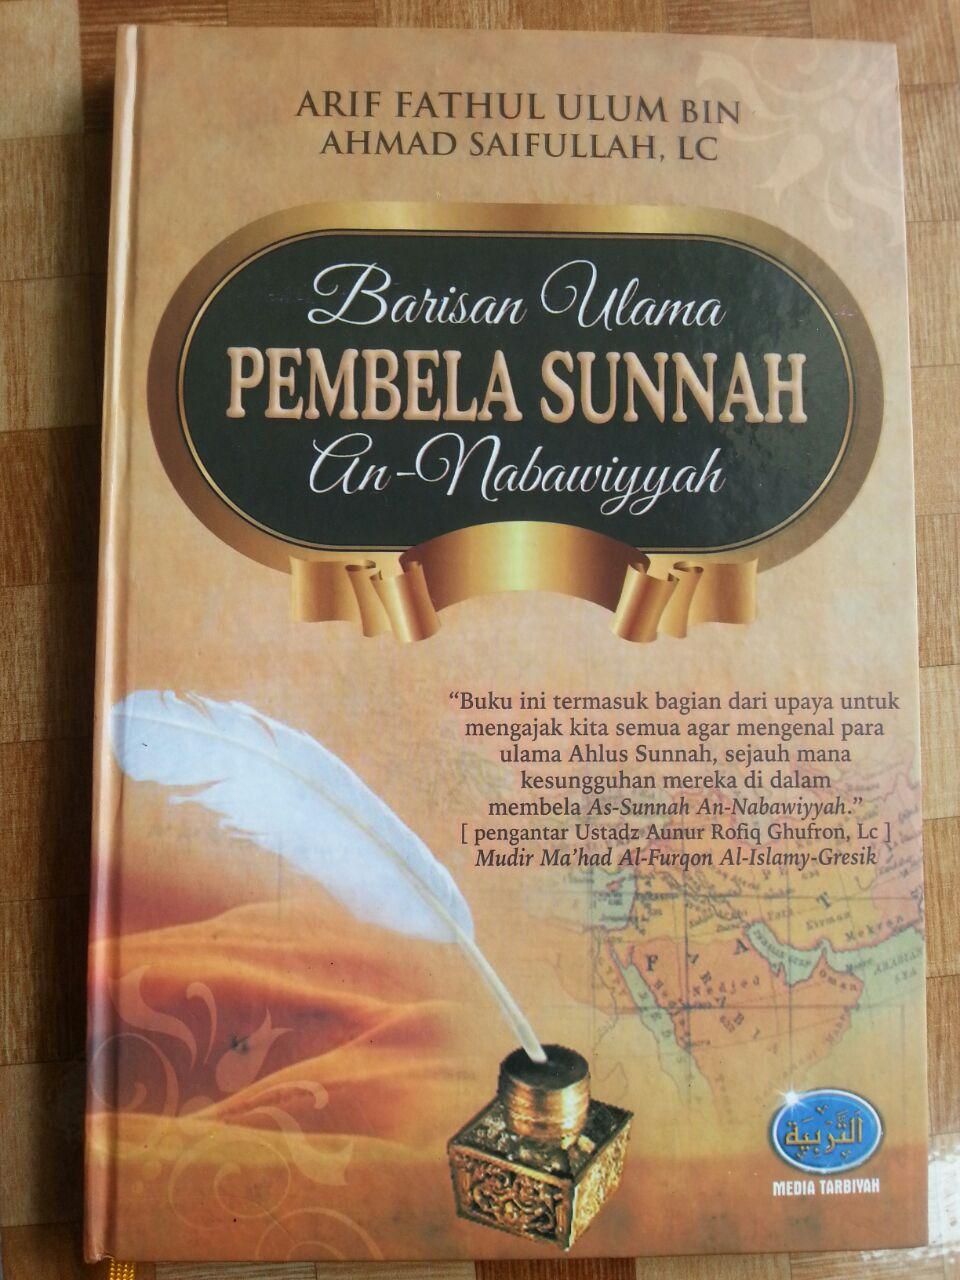 Buku Barisan Ulama Pembela Sunnah An-Nabawiyyah cover 2